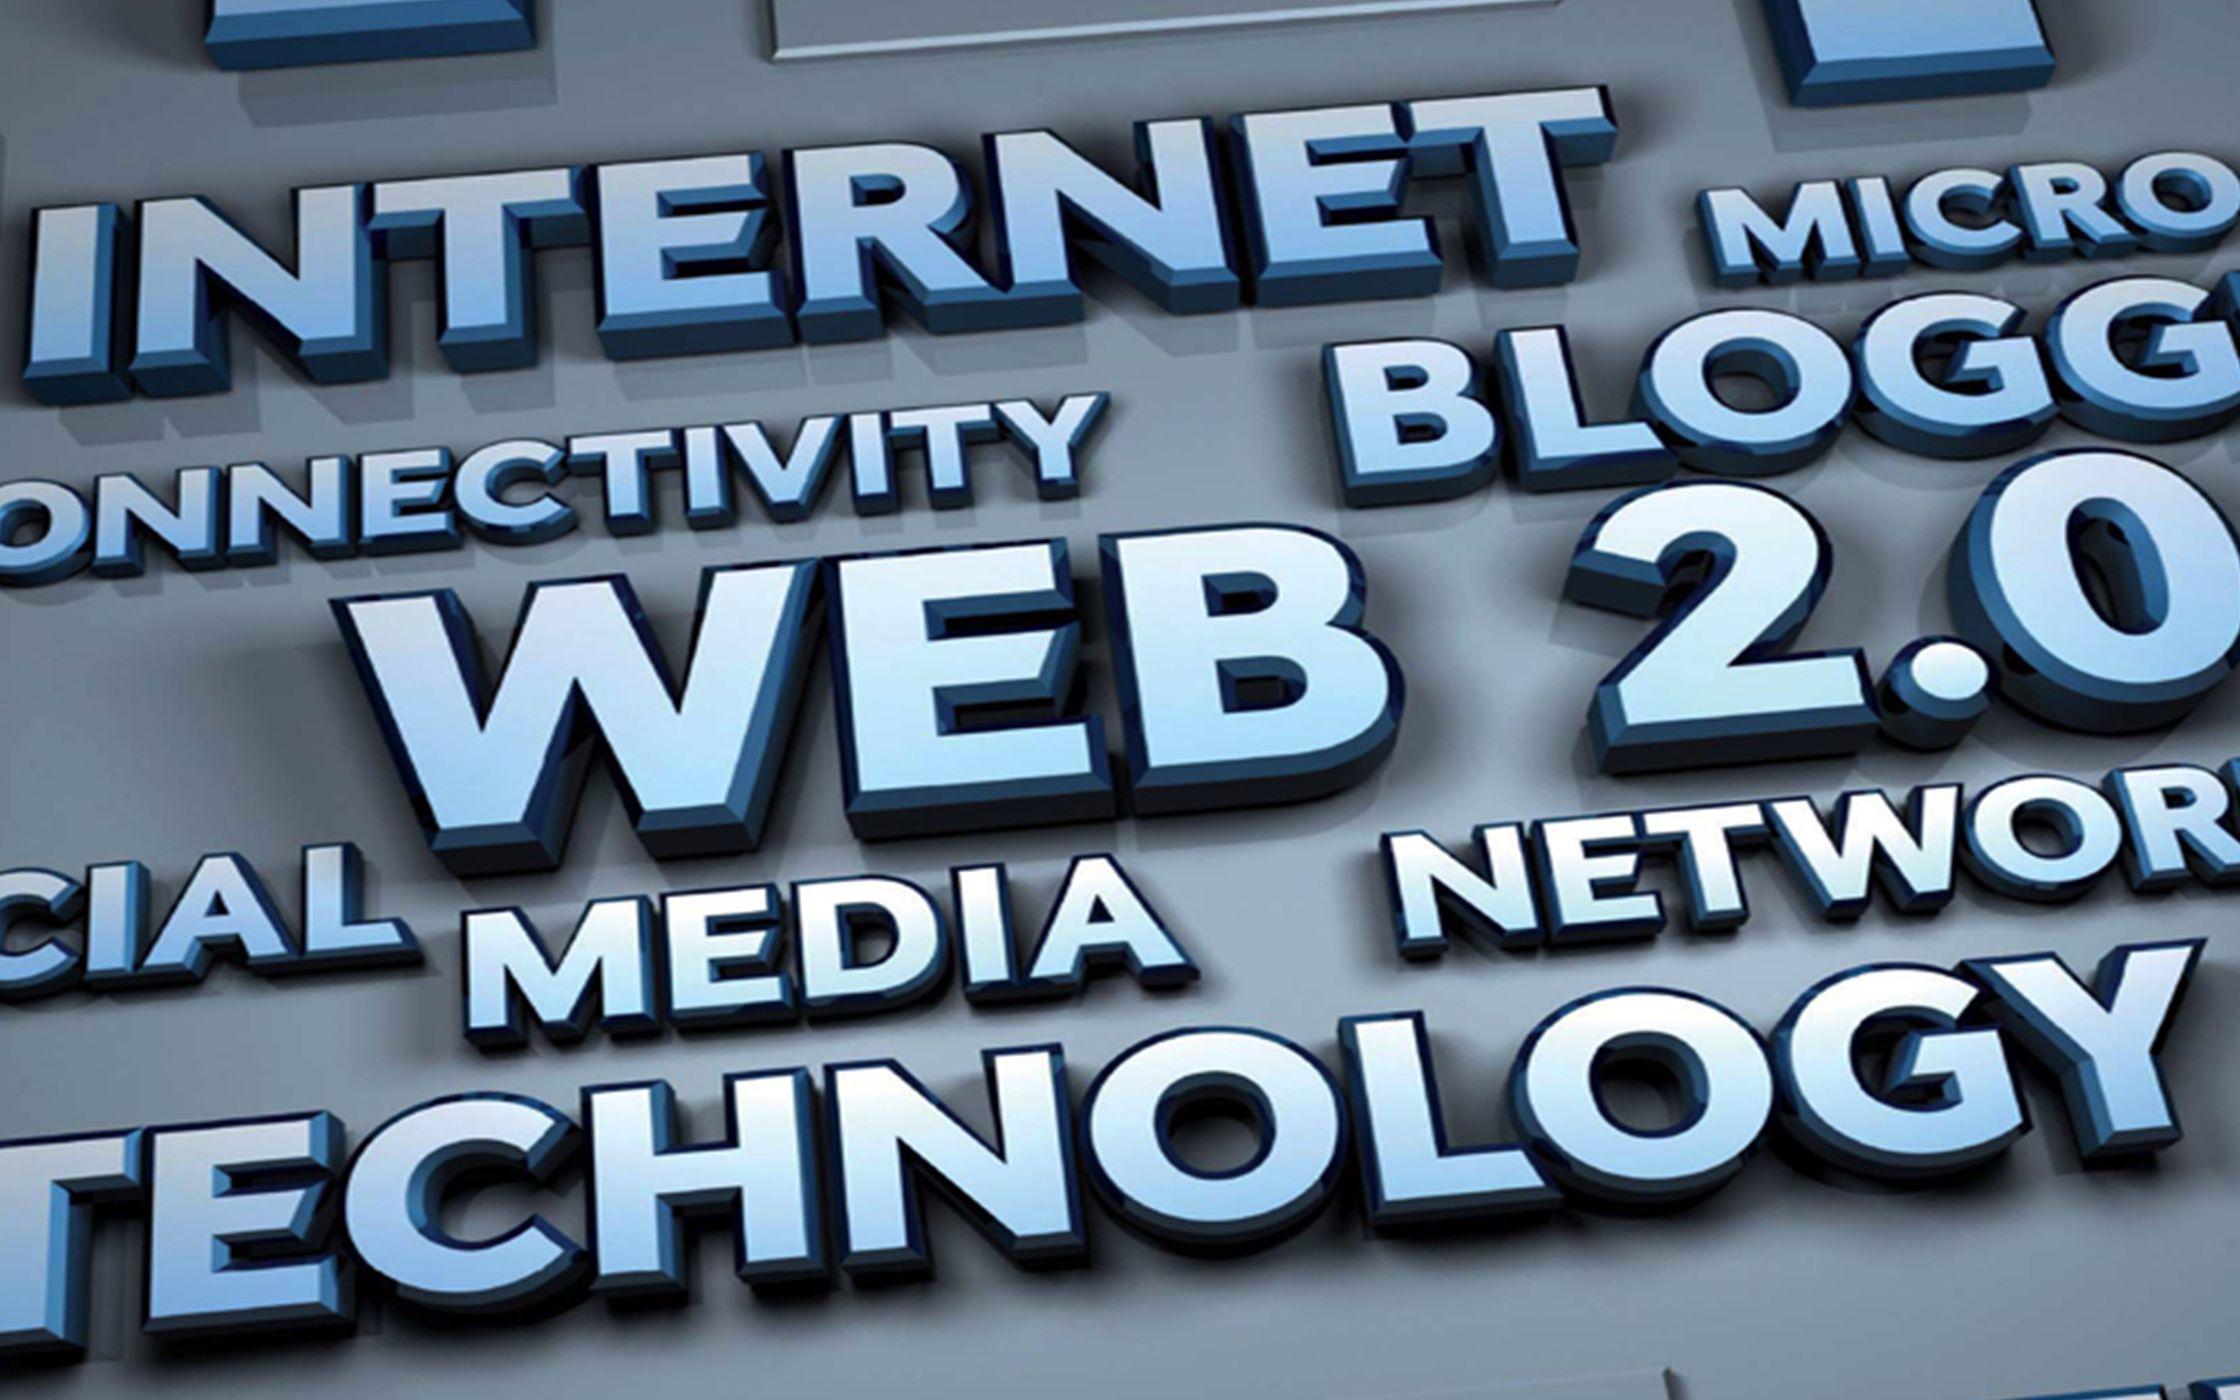 12 1 Was bedeutet web2.0? Was social media?